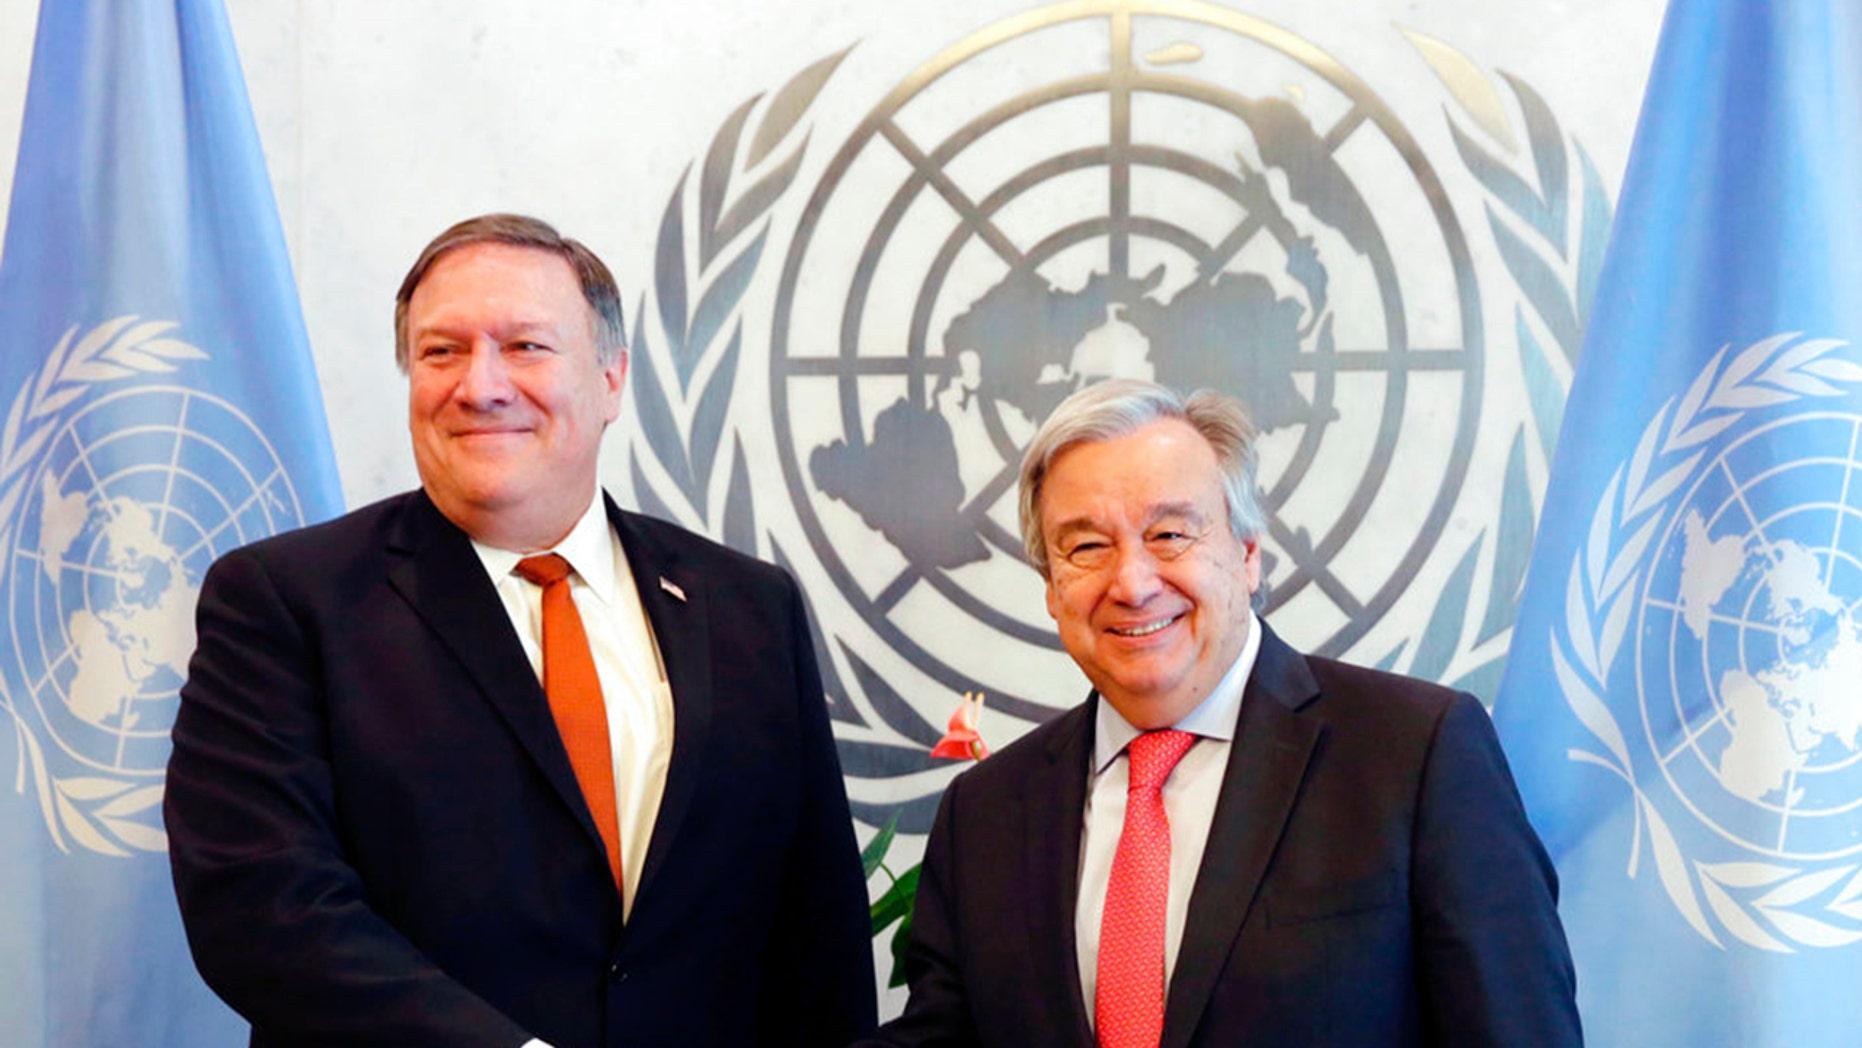 Secretary of State Mike Pompeo, left, met with Secretary-General Antonio Guterres, right, last week.